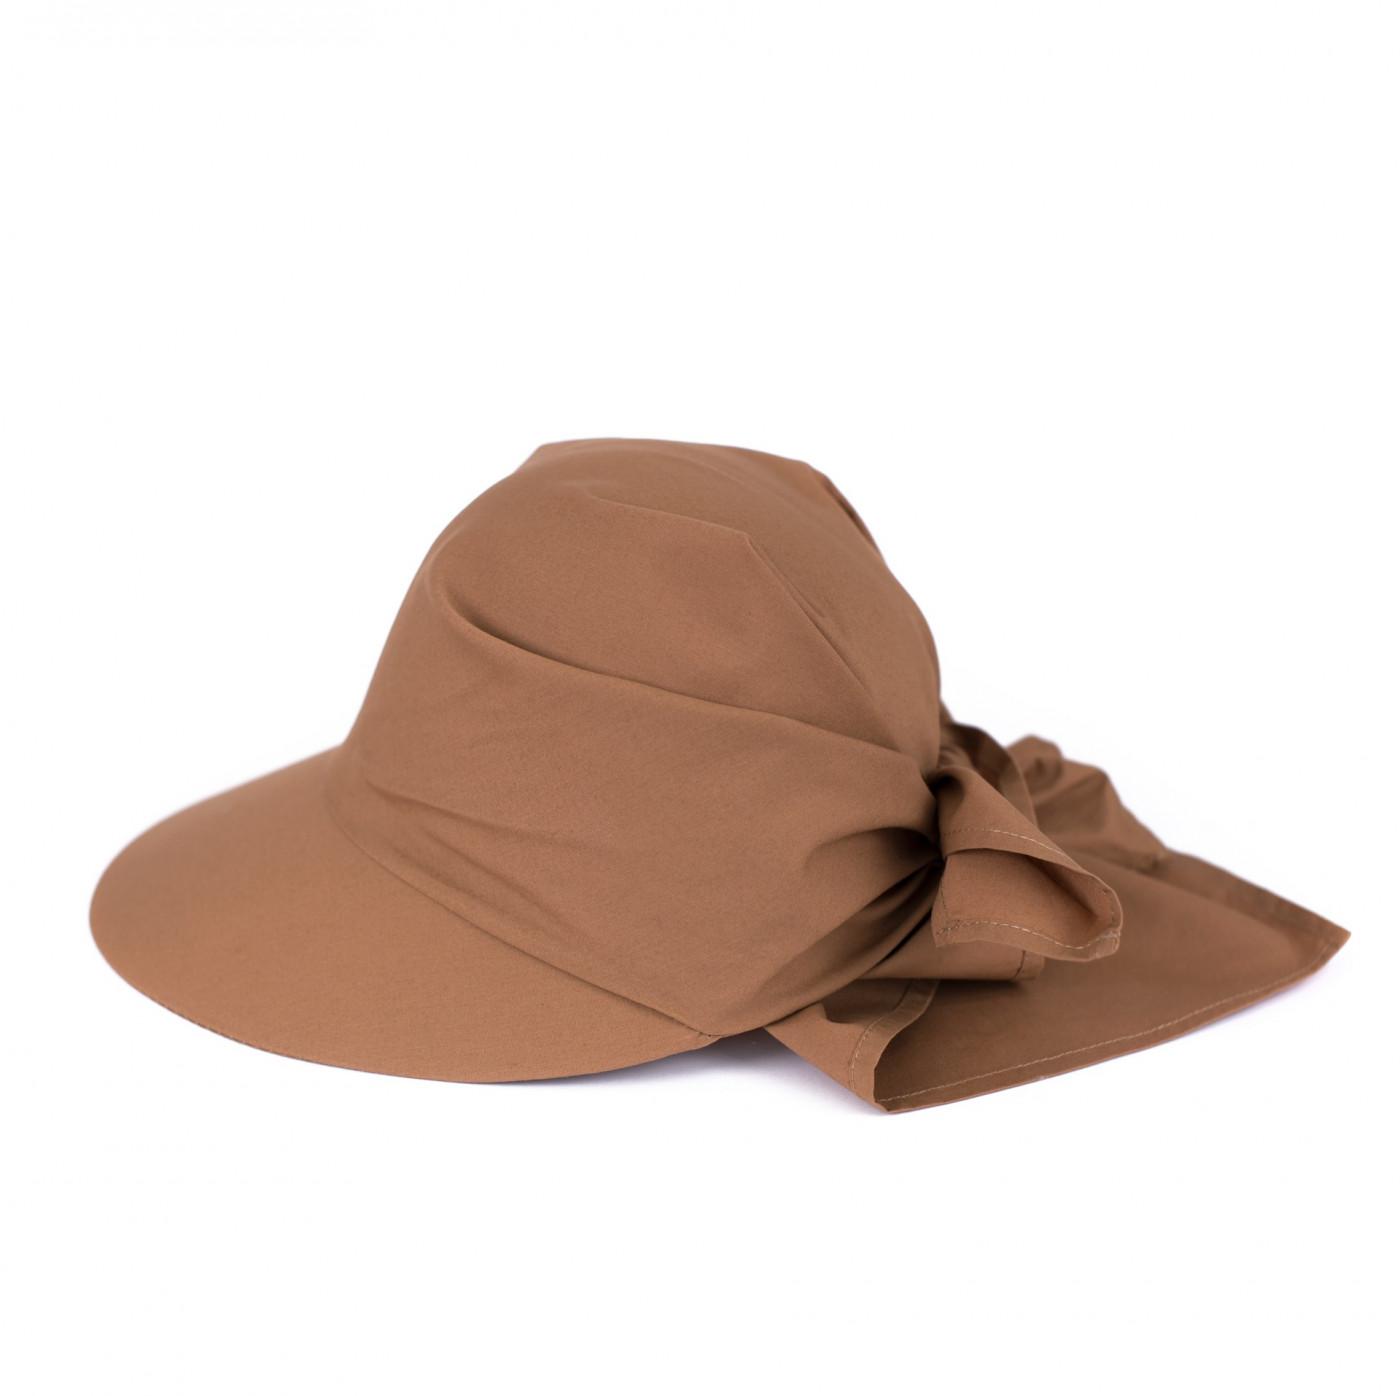 Art Of Polo Woman's Visor Hat cz19429 Dark